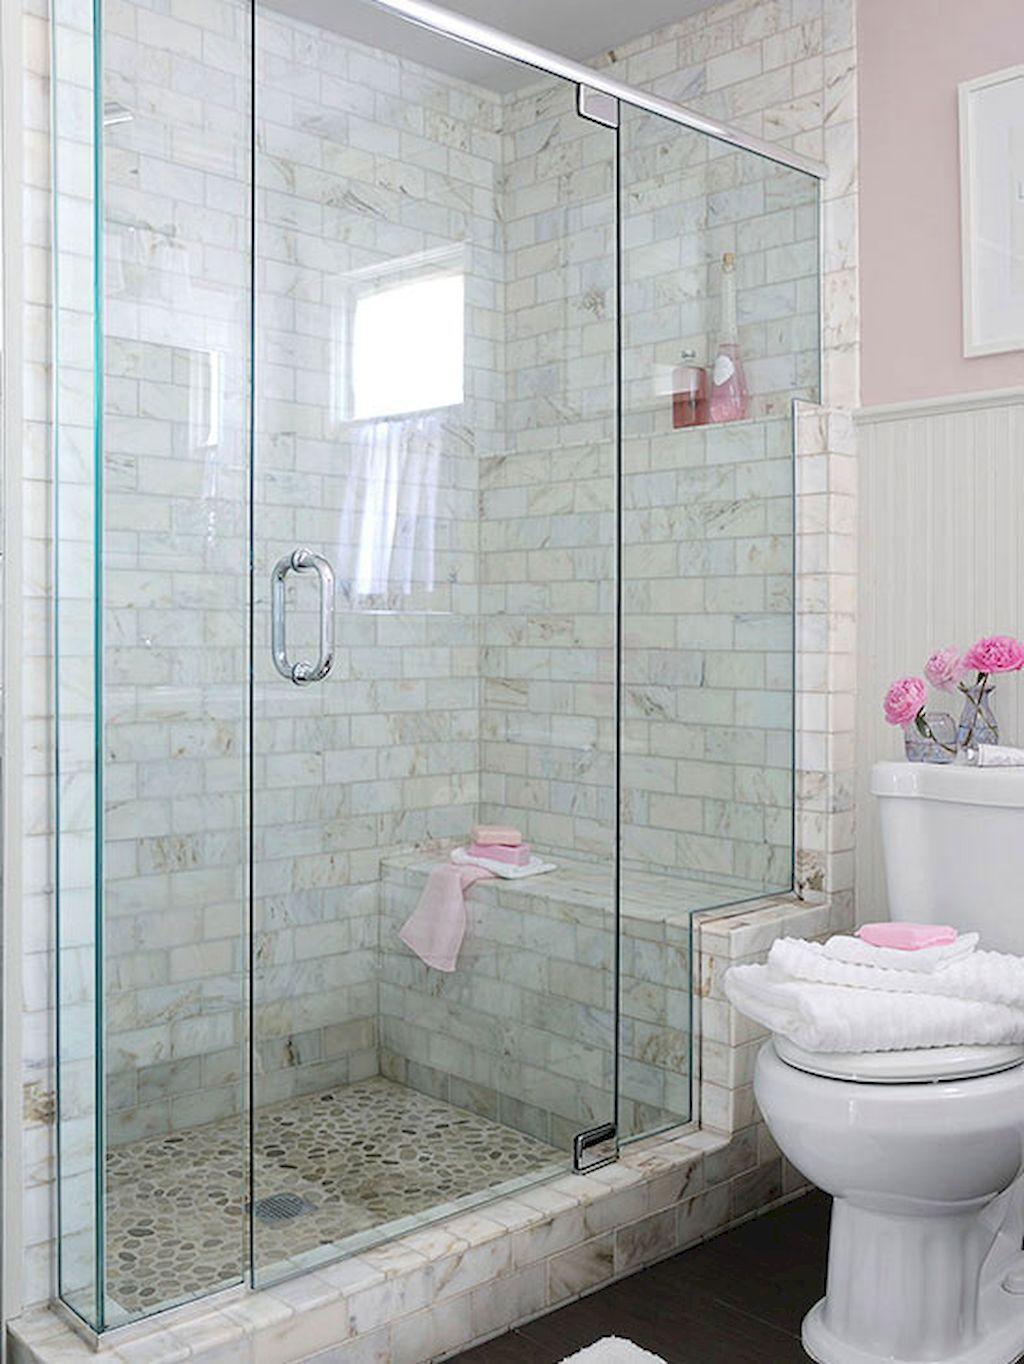 Fresh small master bathroom remodel ideas on a budget (34 | Master ...